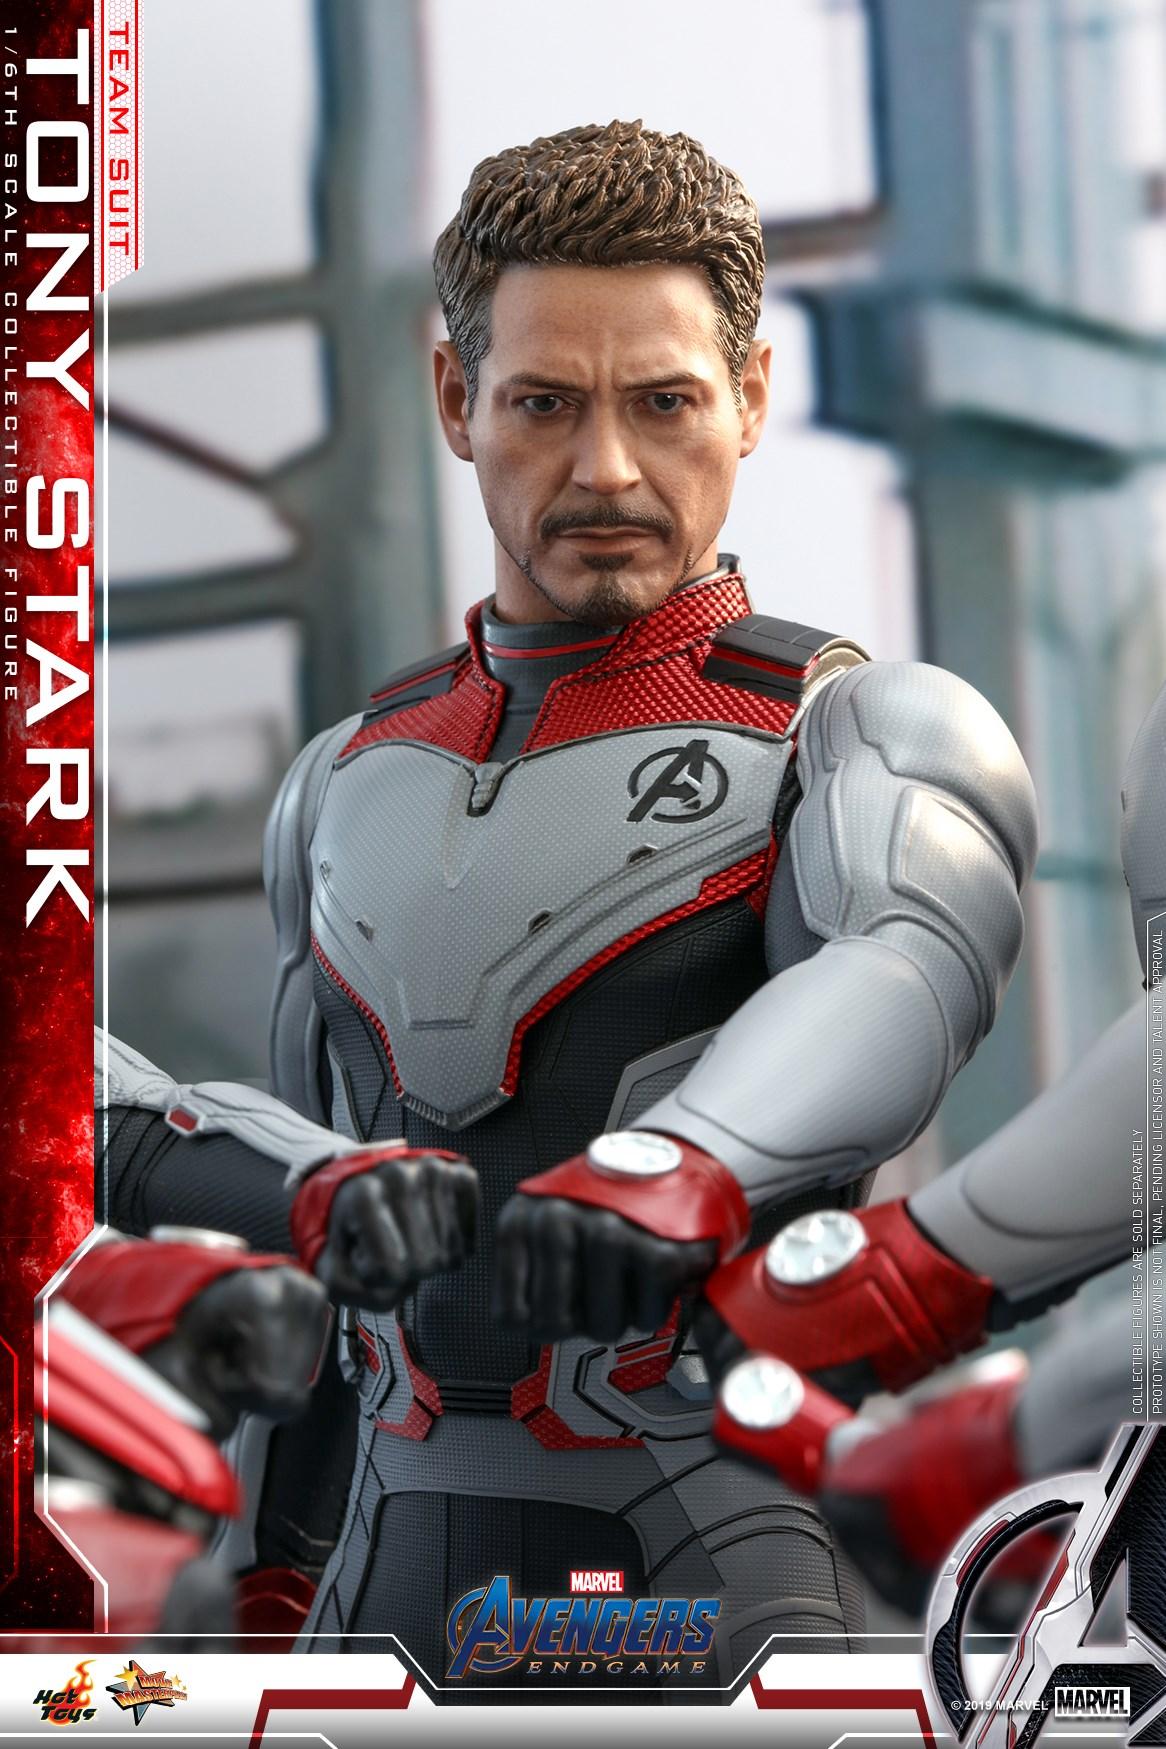 Hot Toys Shows Off Their AVENGERS: ENDGAME Tony Stark Quantum Realm